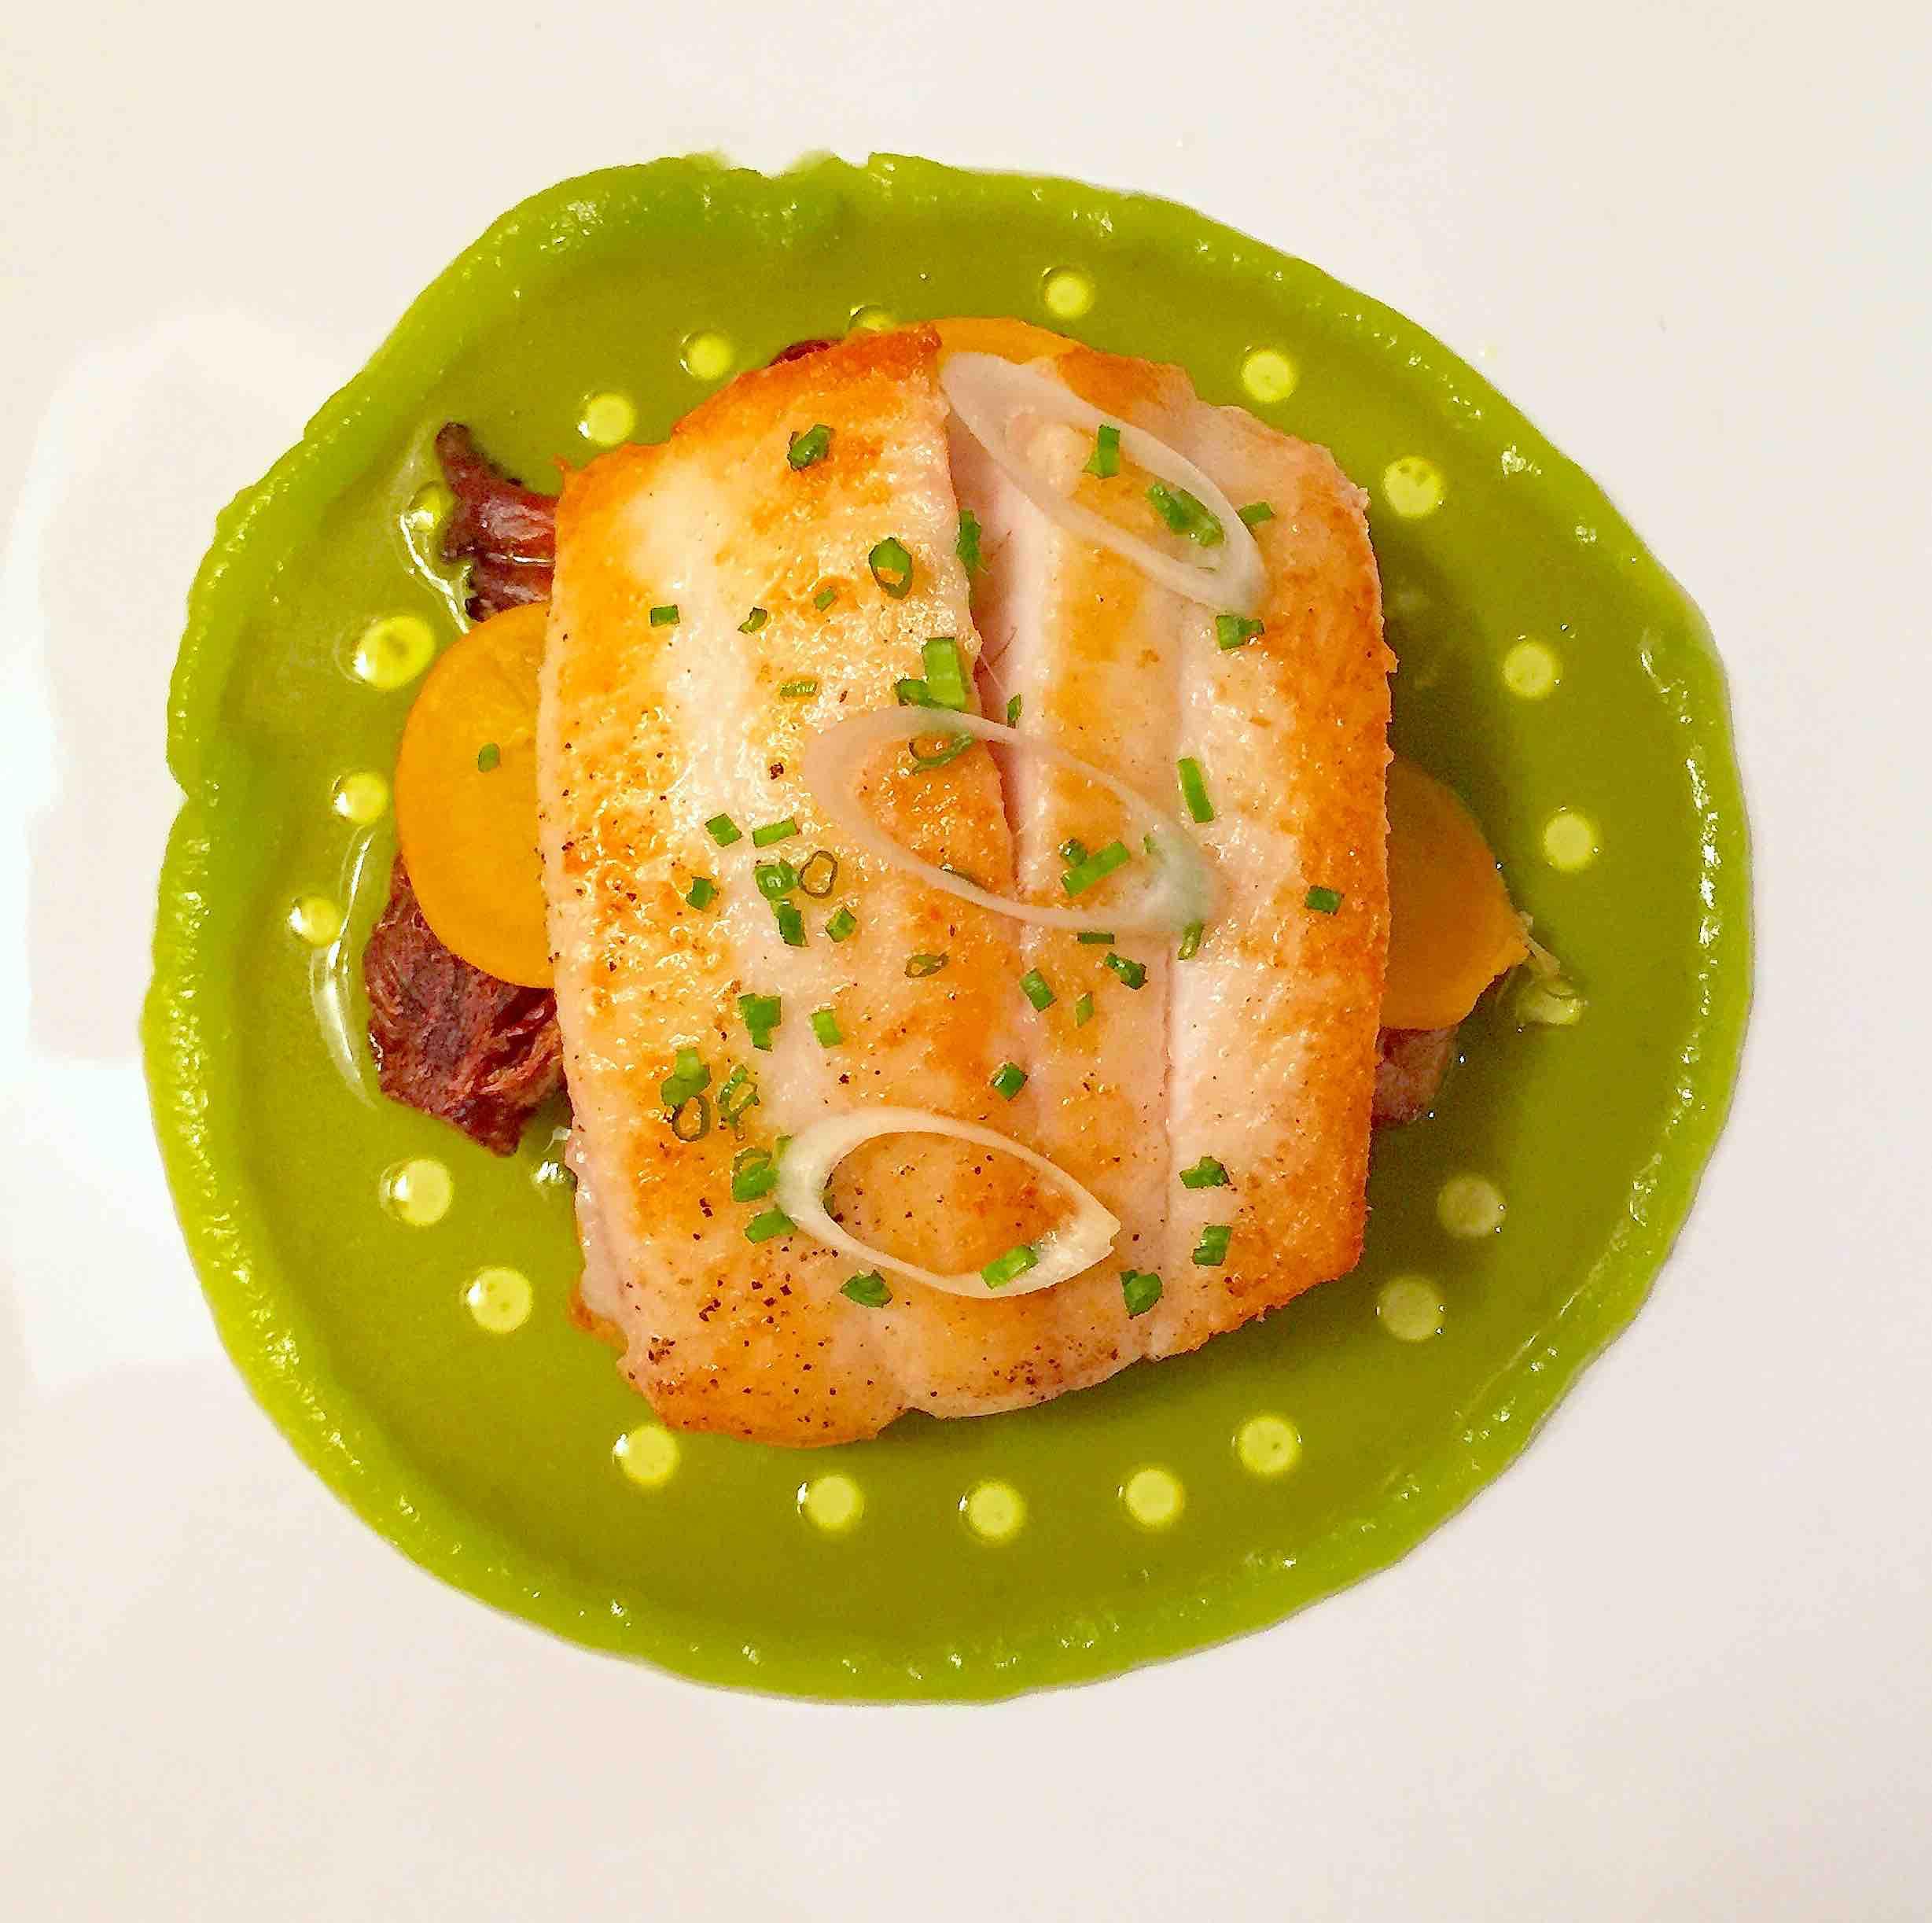 petrale sole recipe with green garlic